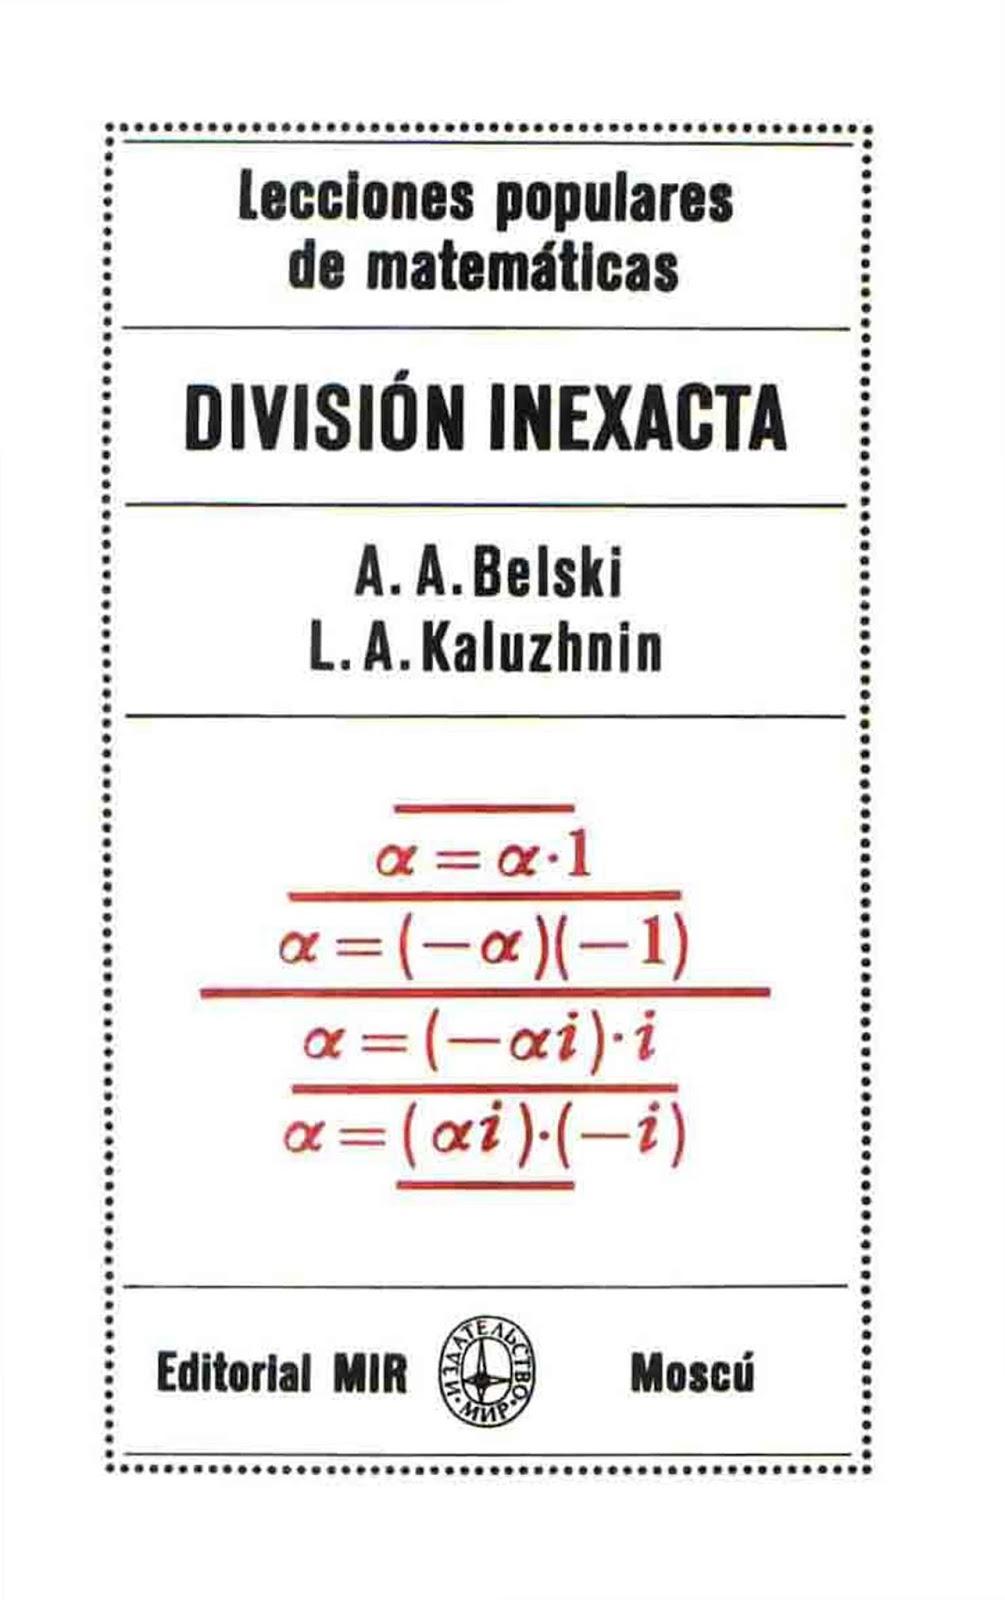 División Inexacta – A. A. Belski & L. A. Kaluzhnin